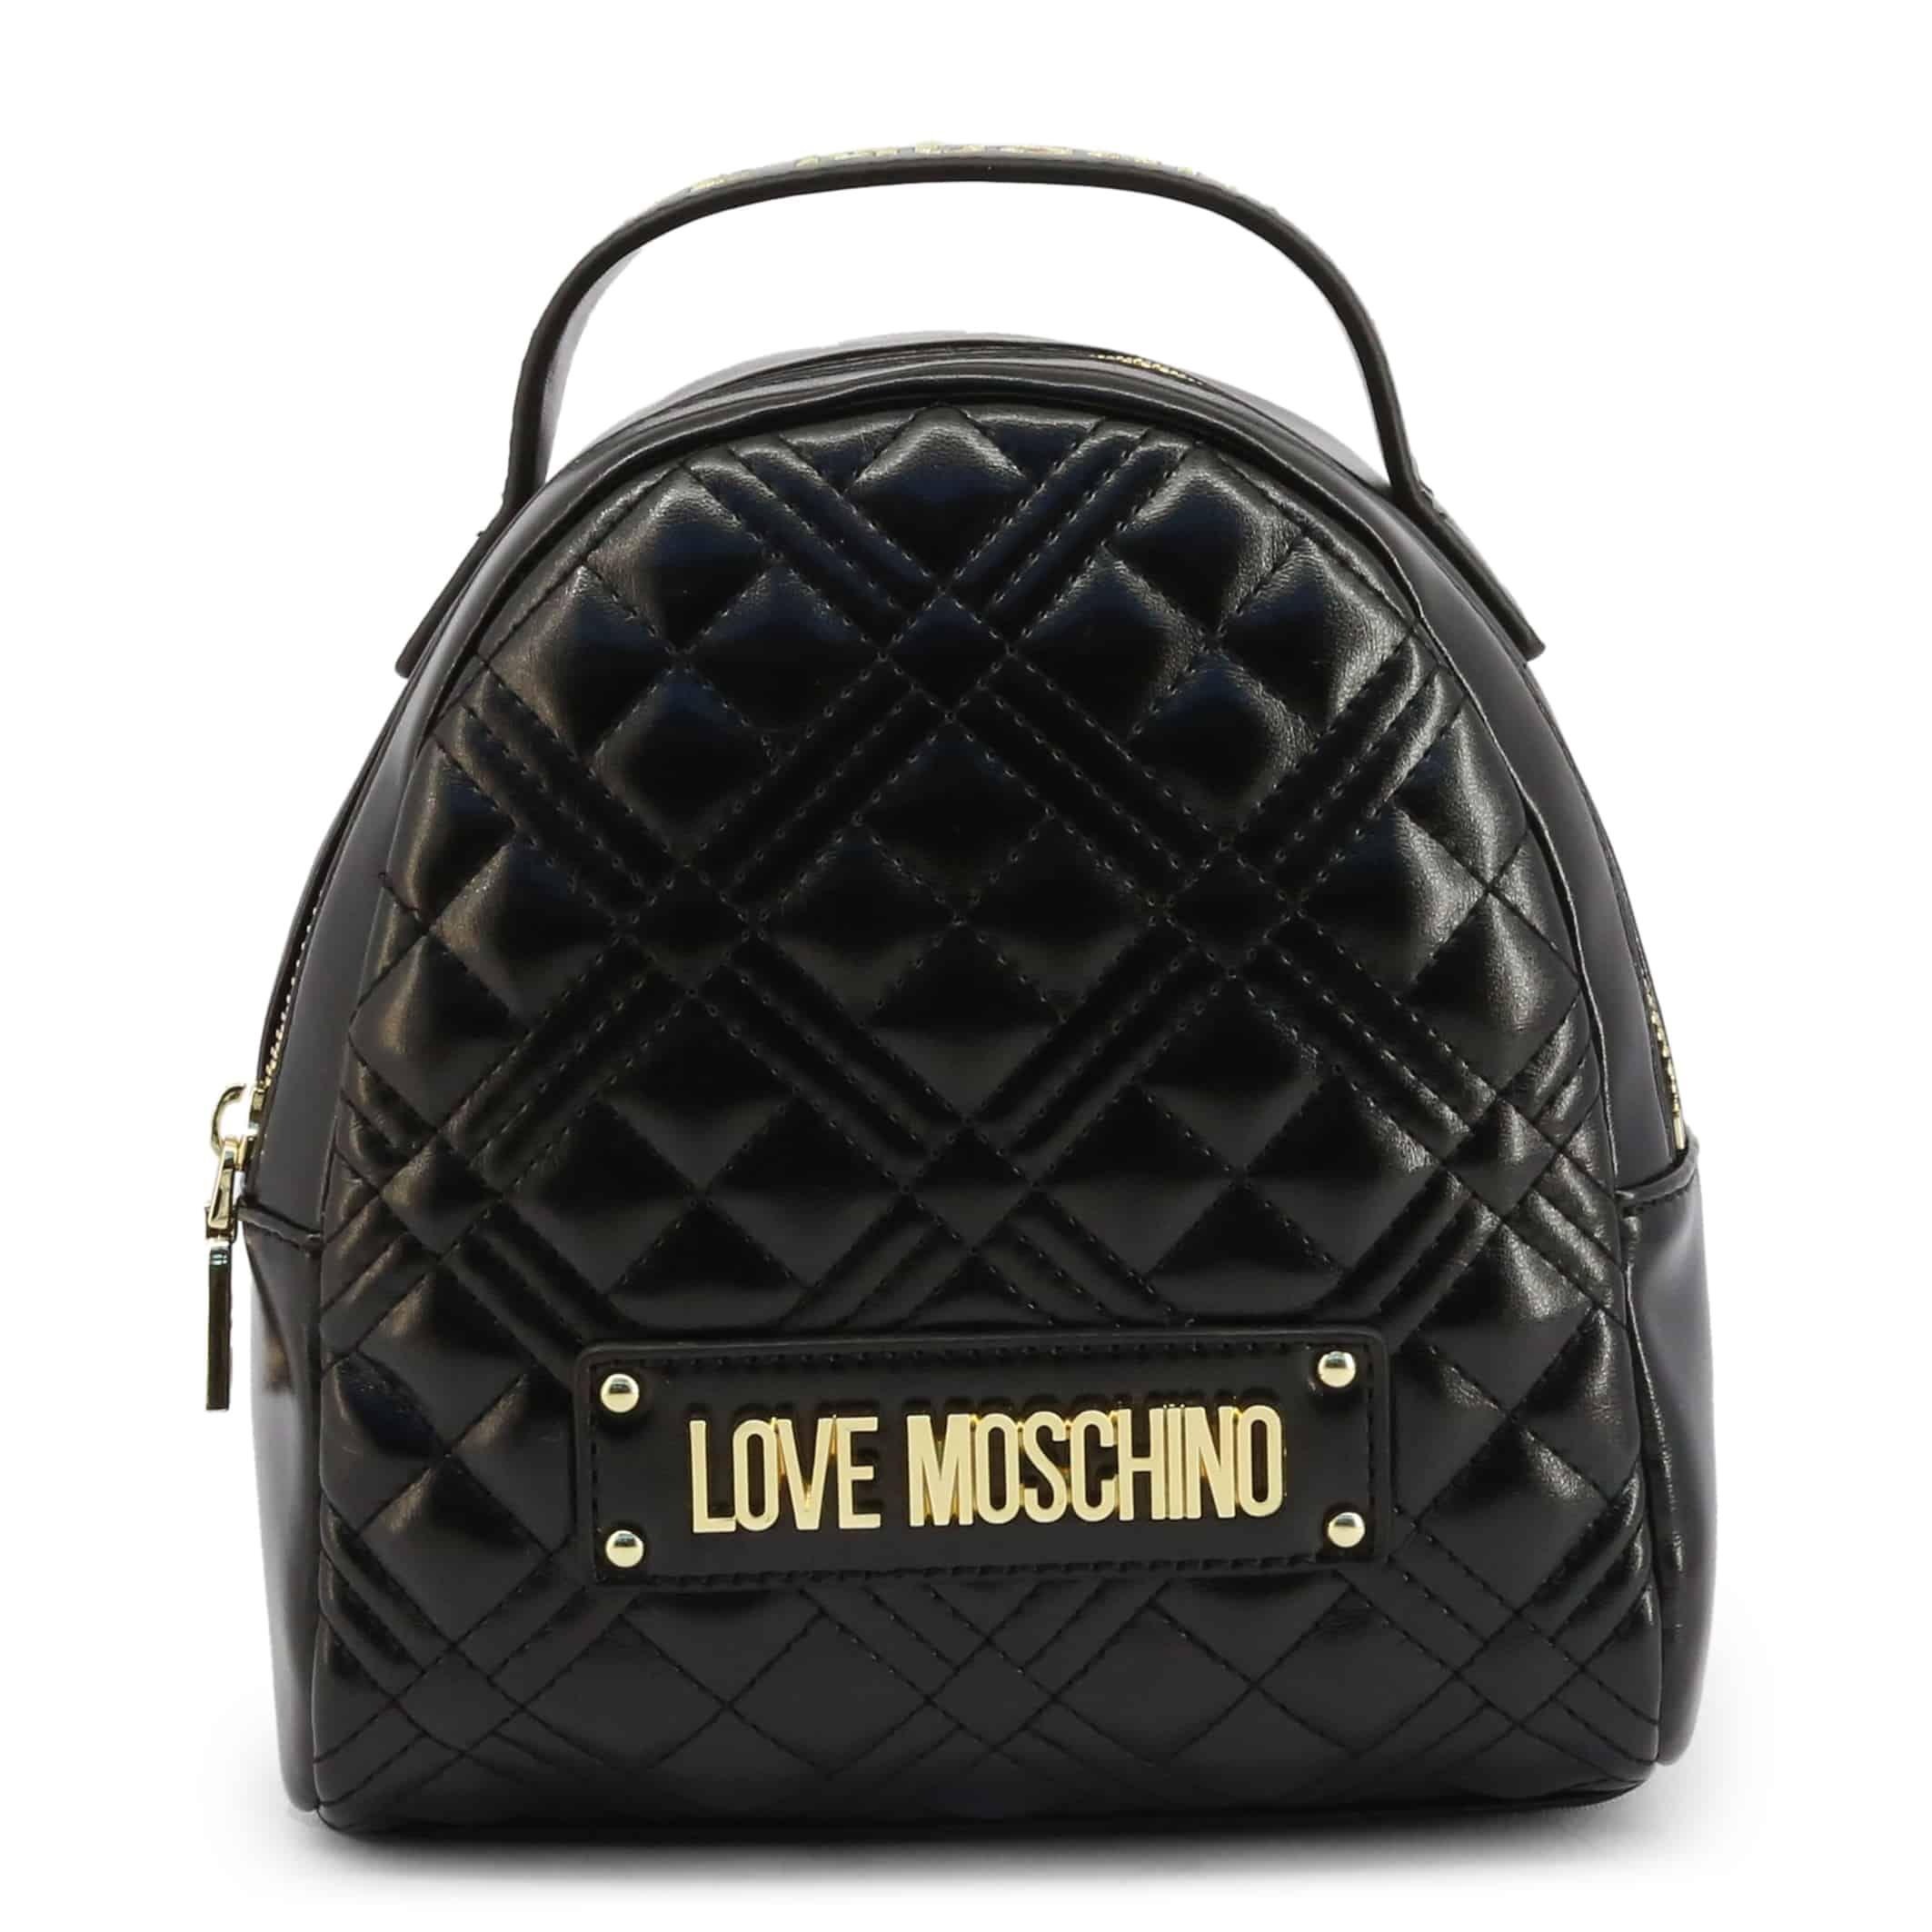 Love Moschino – JC4201PP0BKA – Zwart Designeritems.nl